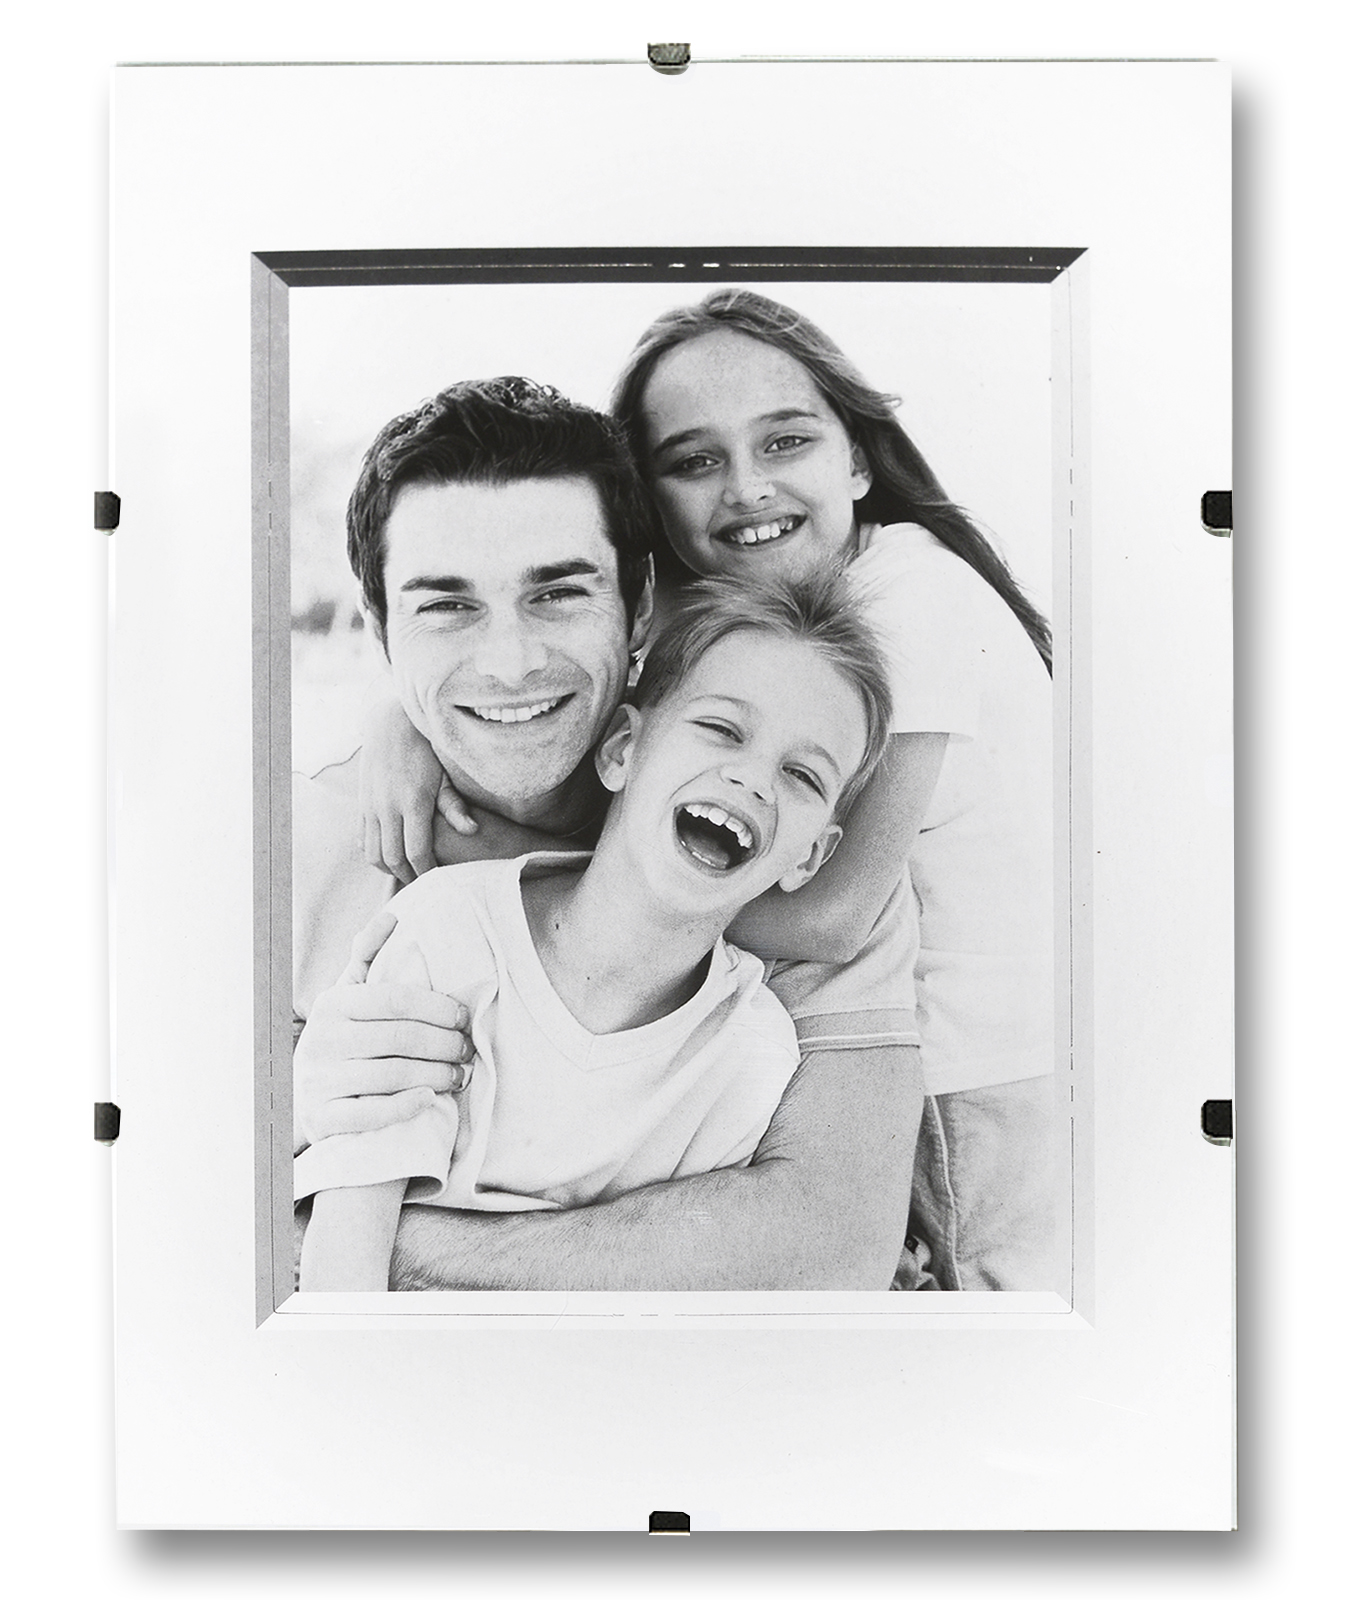 rahmenloser bilderrahmen bilderhalter bildtr ger. Black Bedroom Furniture Sets. Home Design Ideas